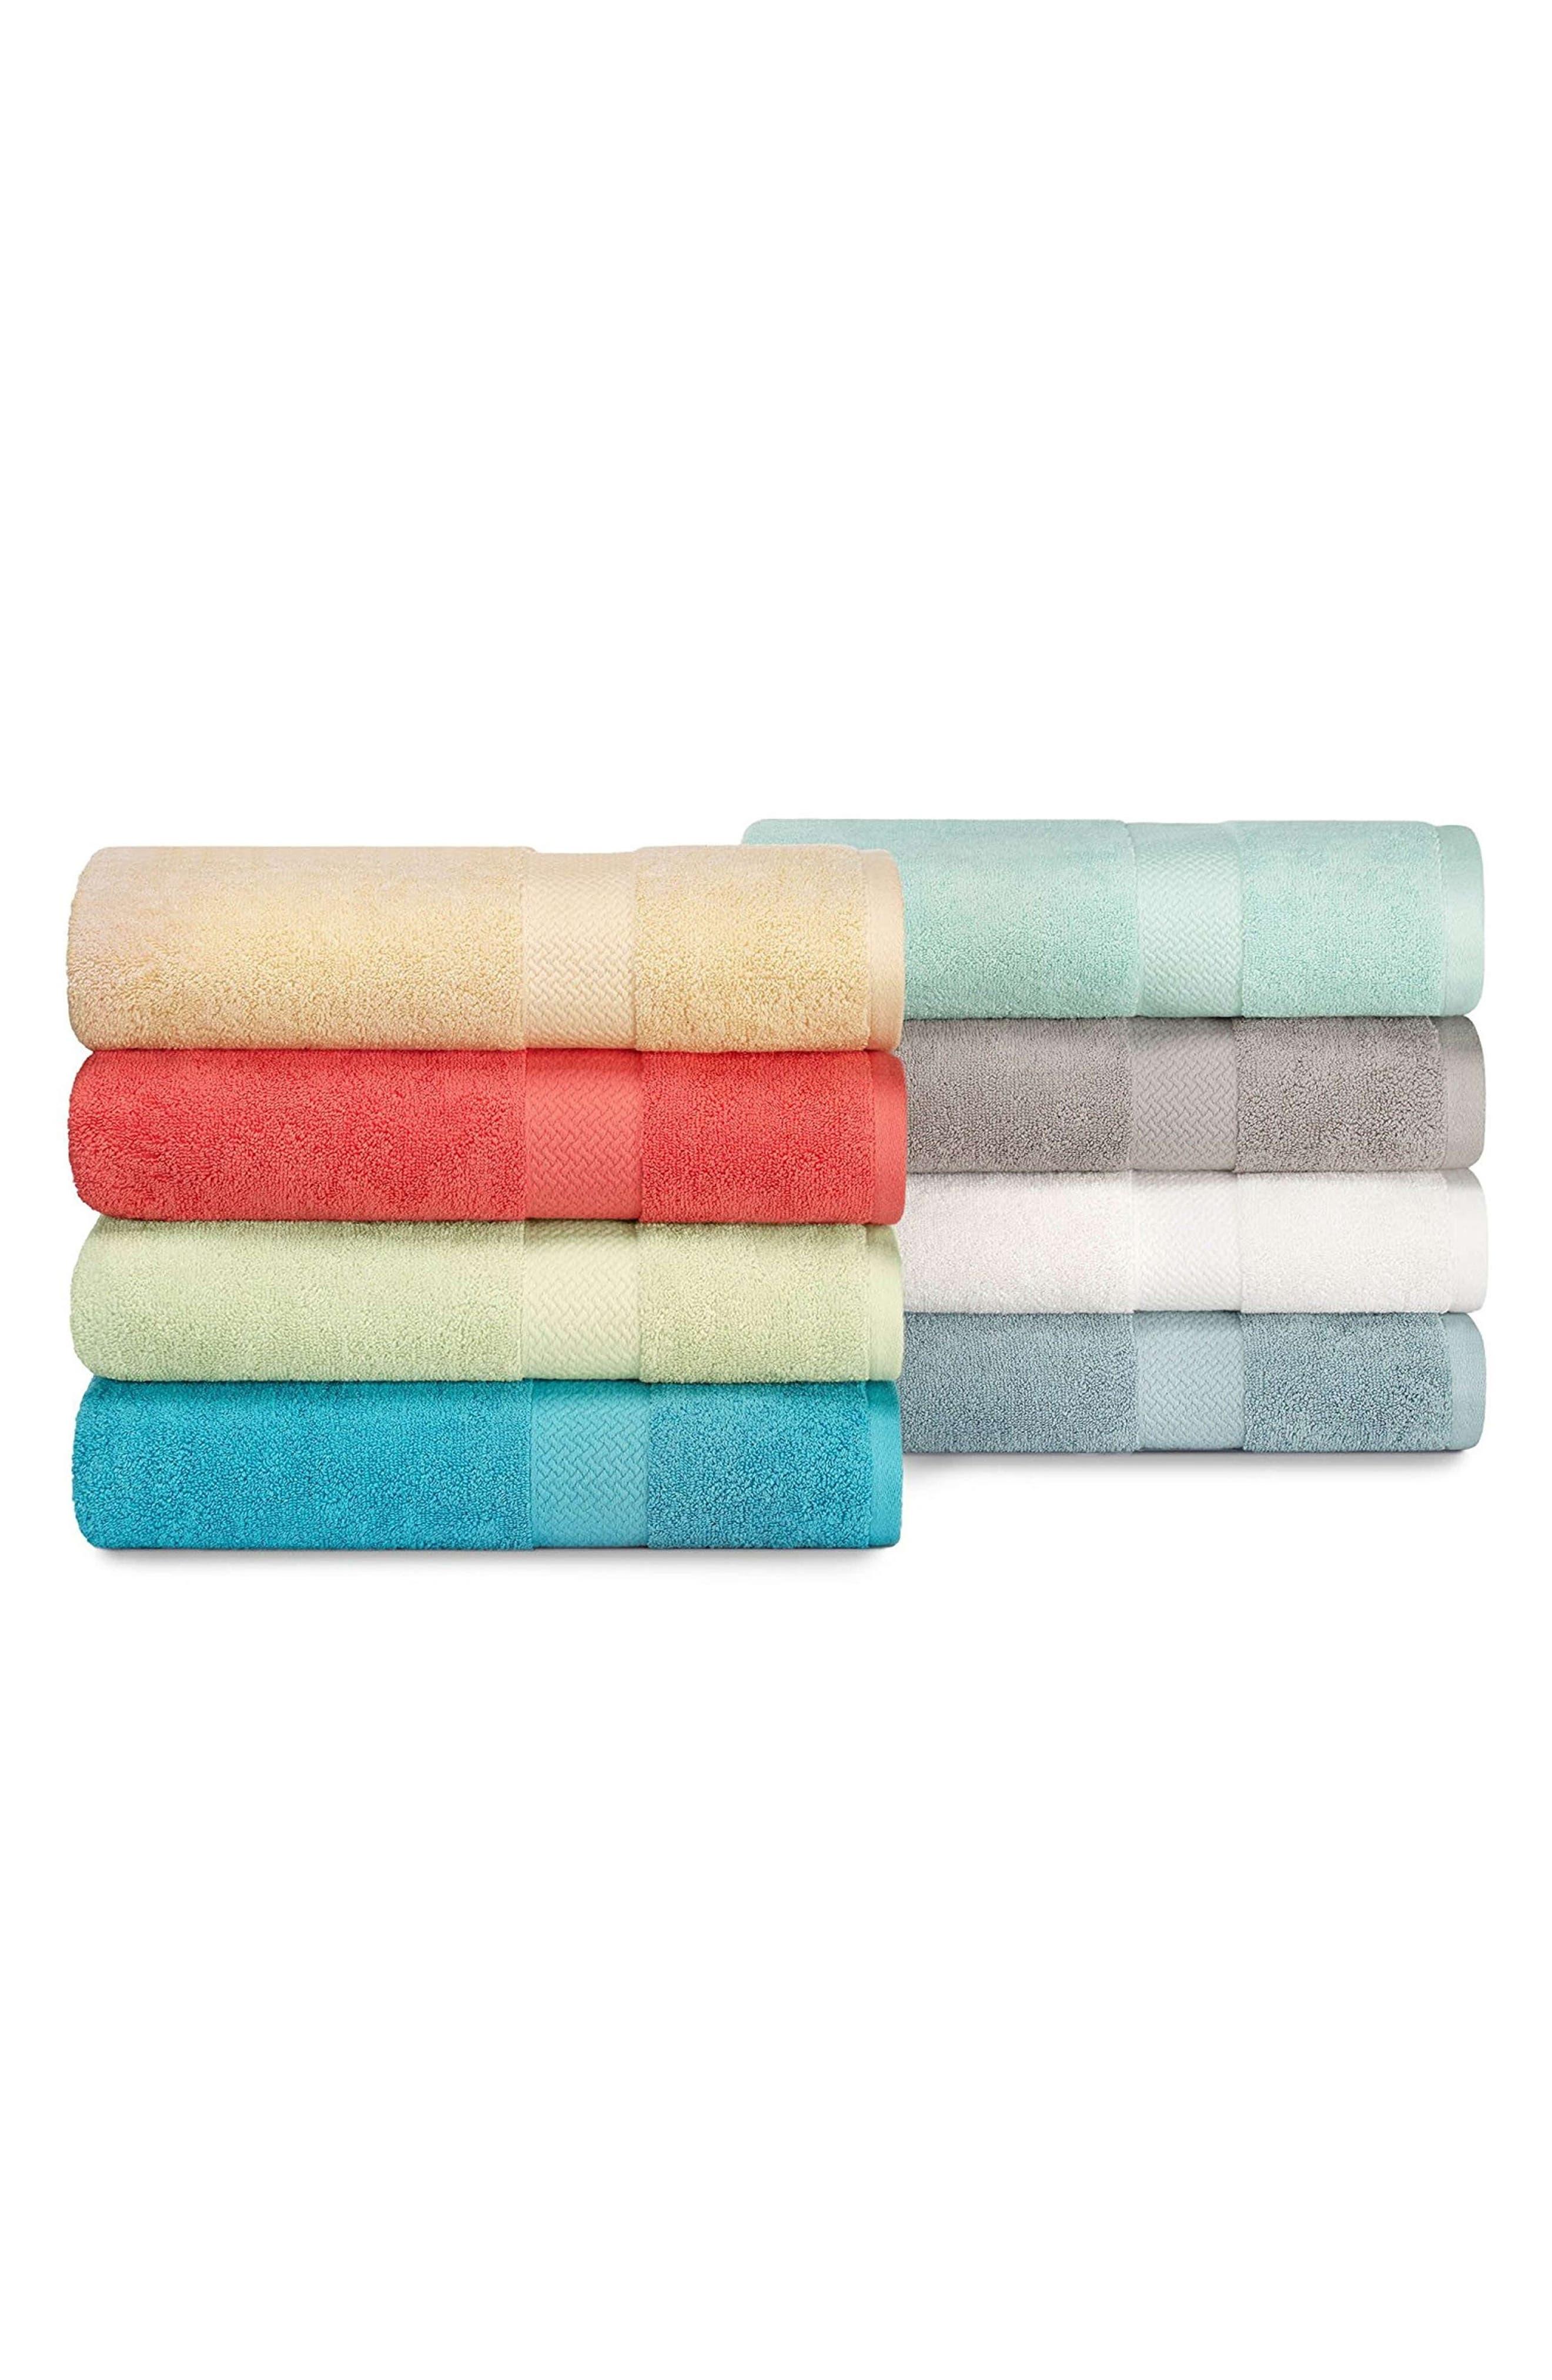 Cypress Bay 6-Piece Towel Set,                             Alternate thumbnail 2, color,                             WHITE